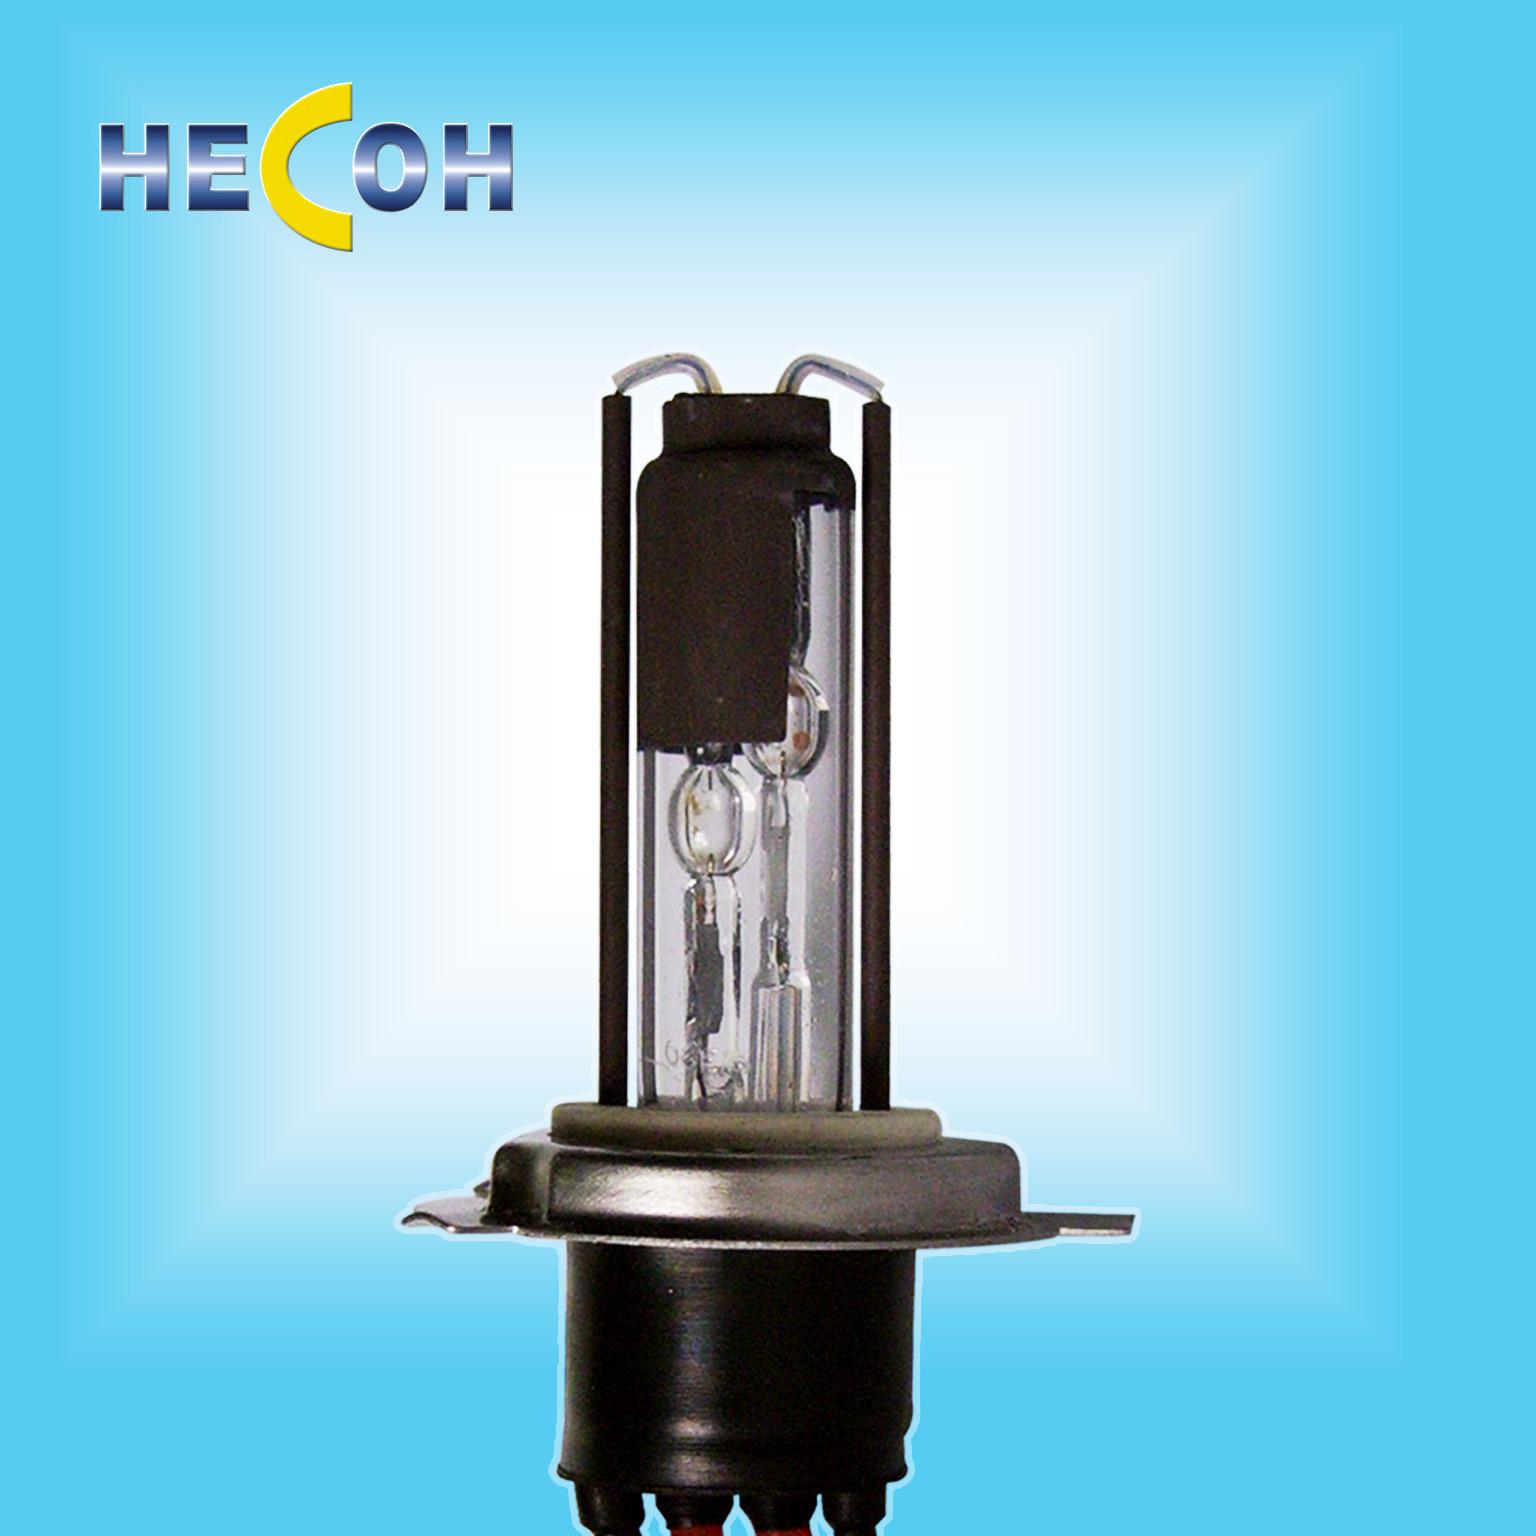 machine quality for high laser yag xenon china productimage lamp krypton ynjqelucorcu